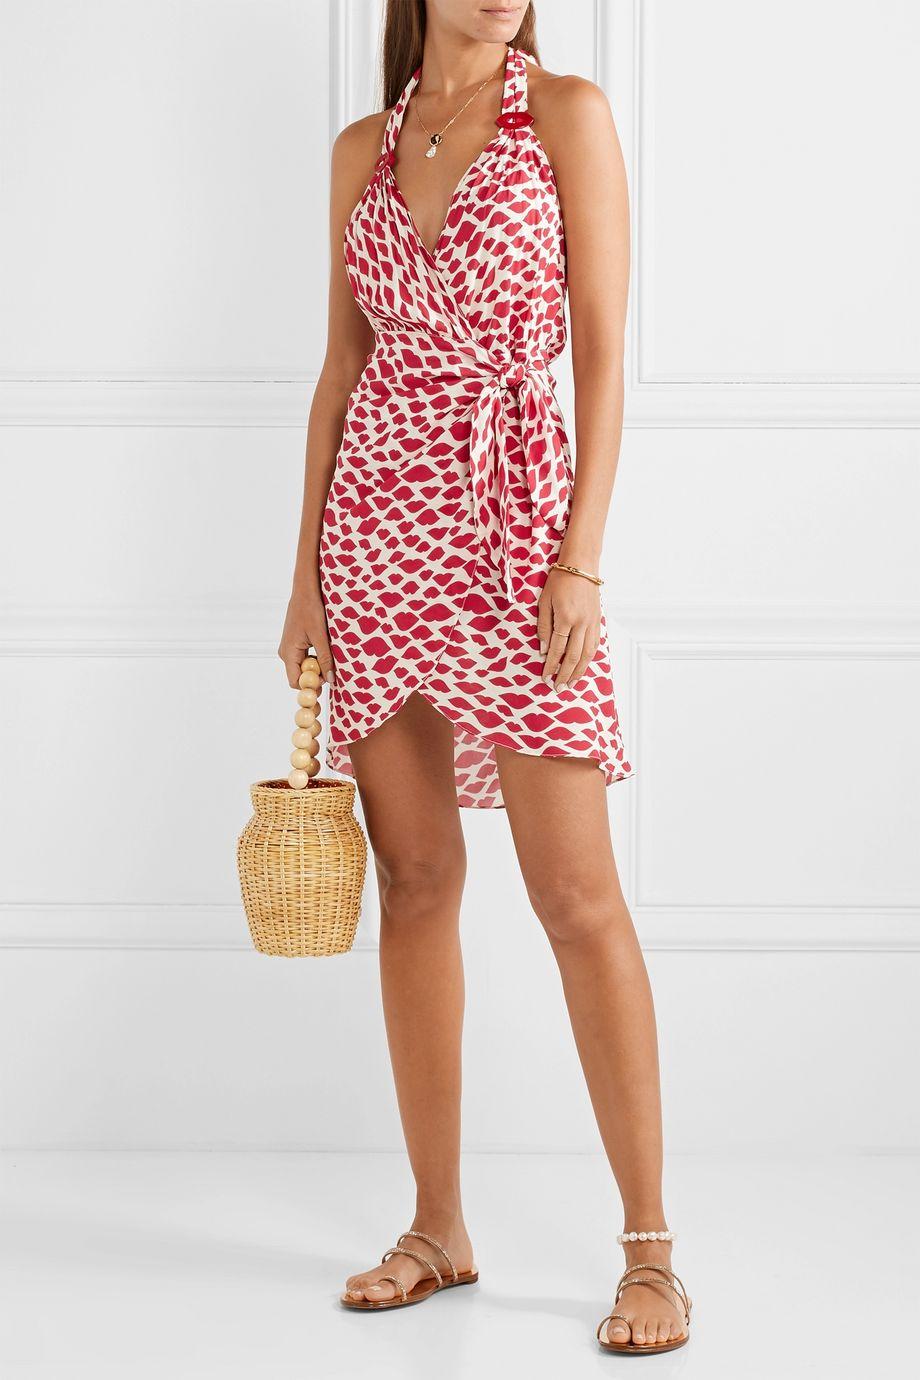 Adriana Degreas Bacio printed voile halterneck mini wrap dress